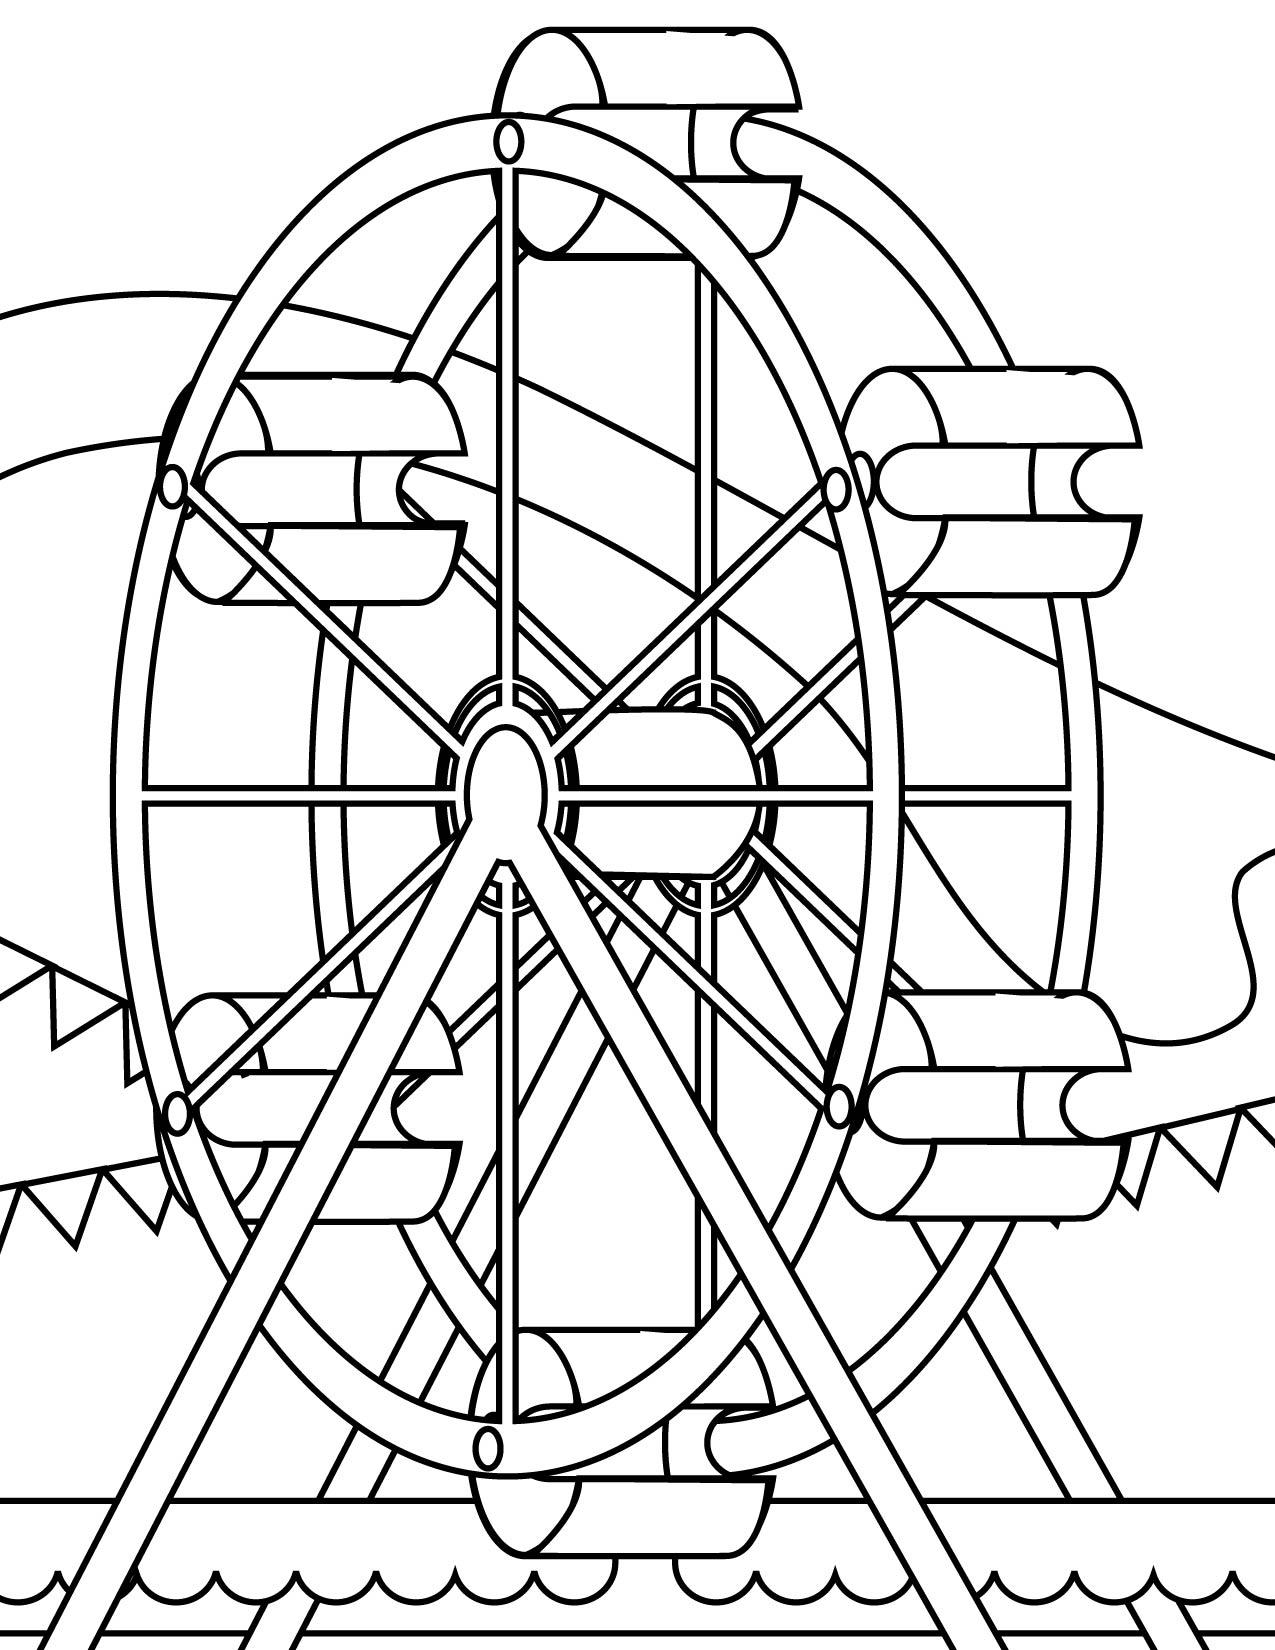 Free Ferris Wheel Cartoon, Download Free Clip Art, Free